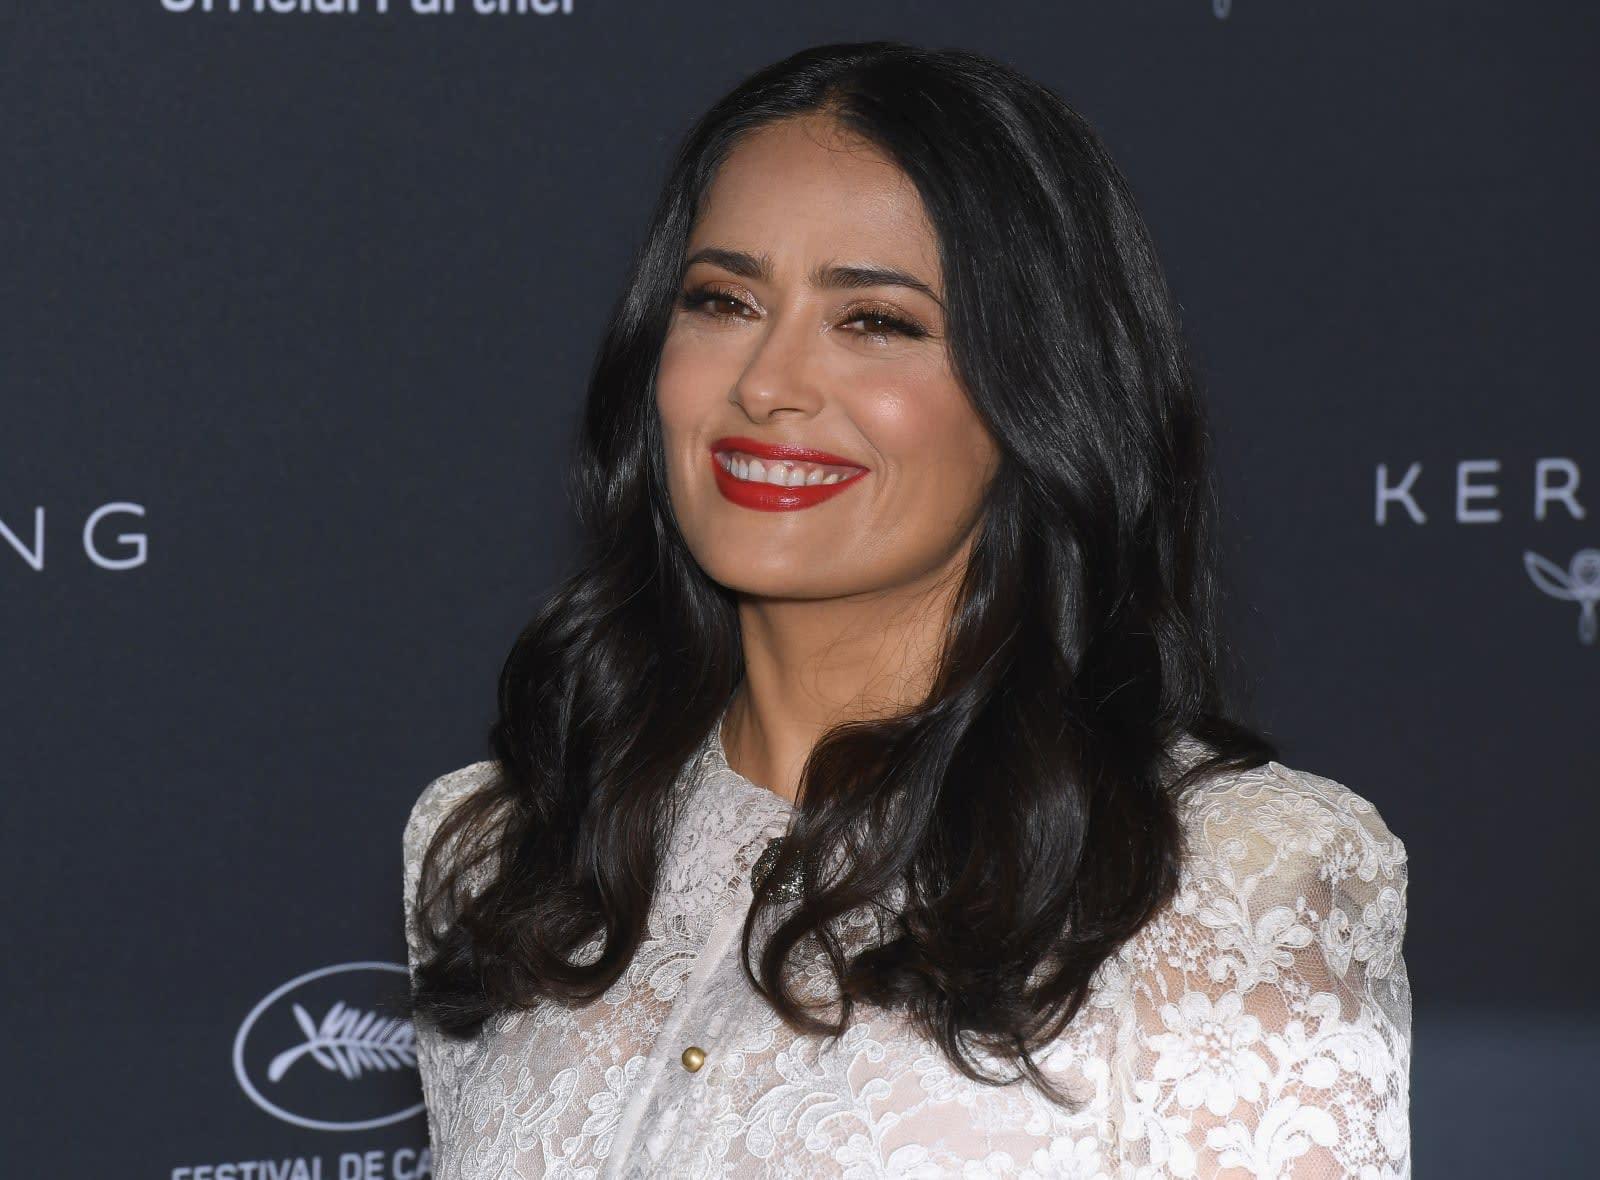 New international Netflix series include Salma Hayek's 'Monarca'